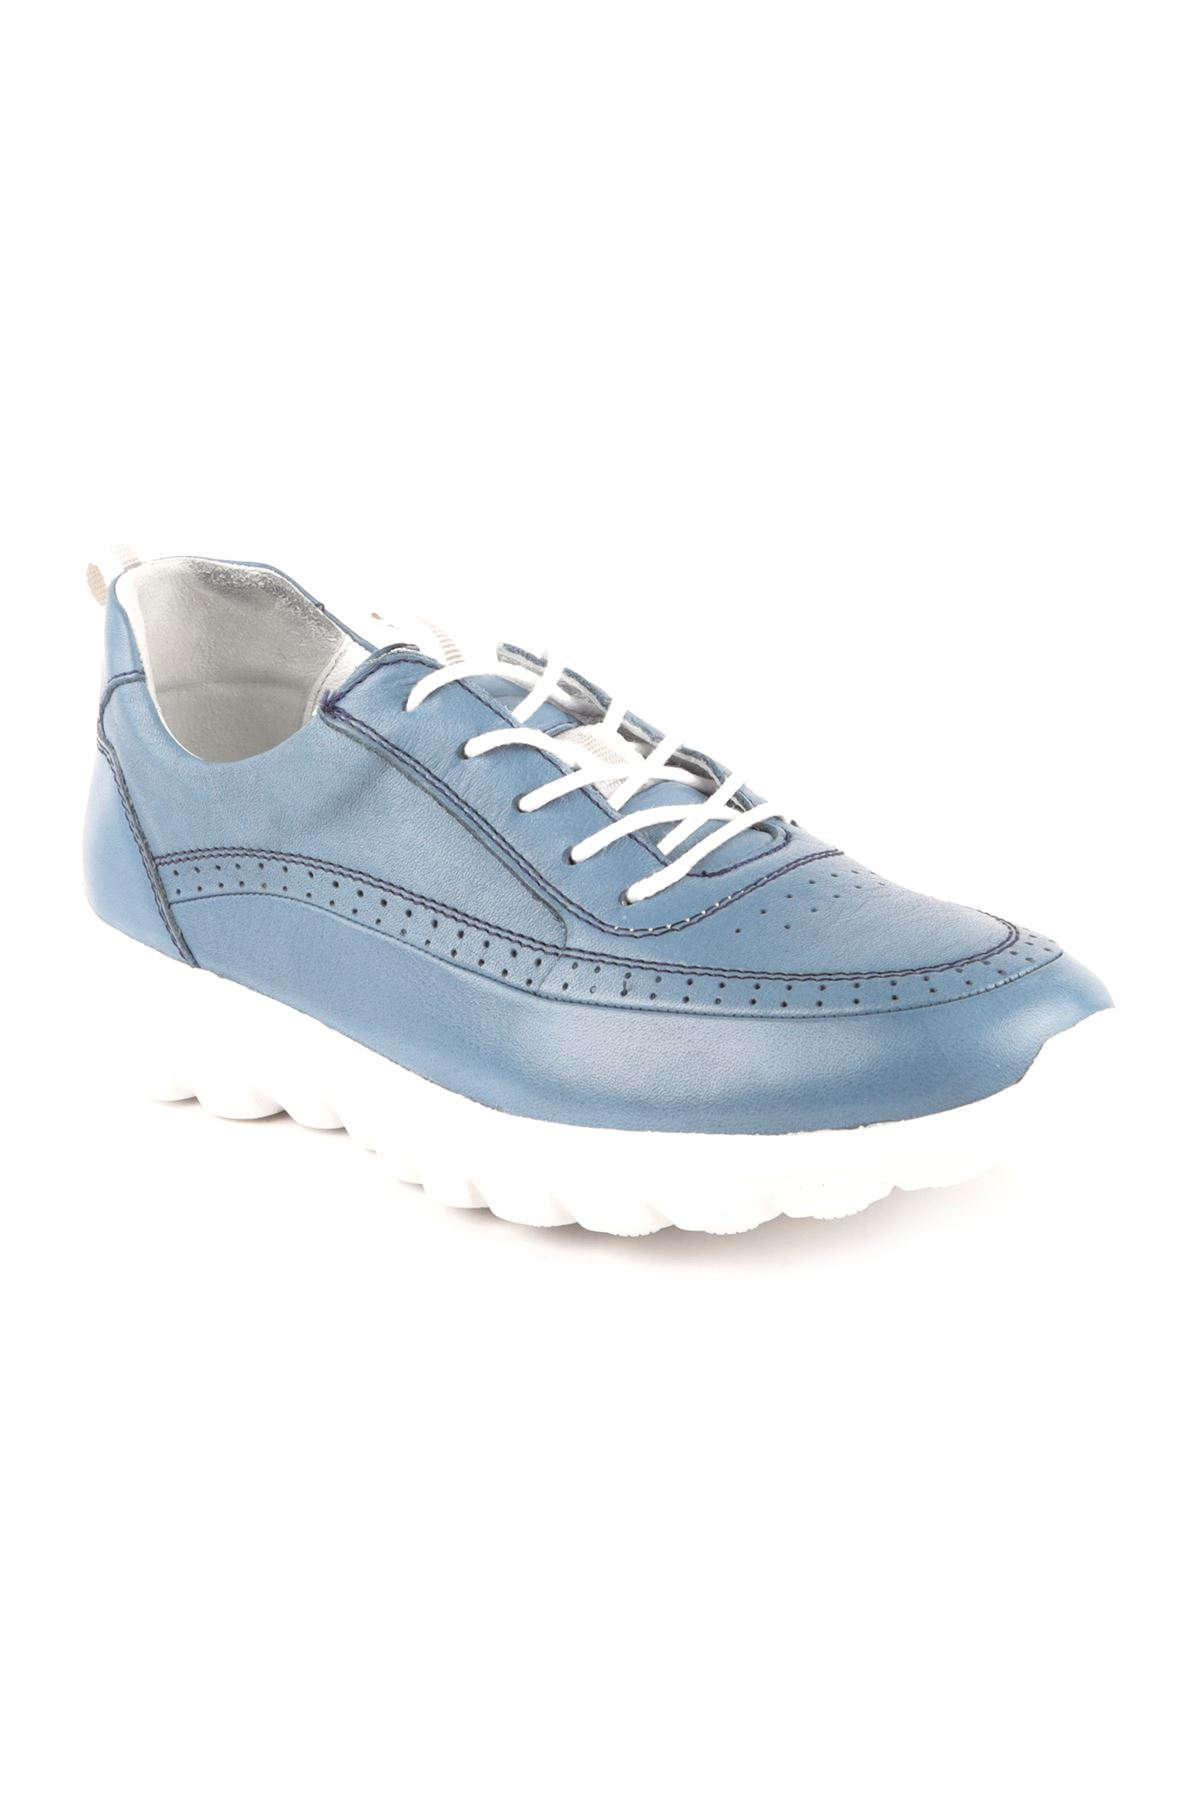 Libero Dİ2018 Mavi Spor Ayakkabı